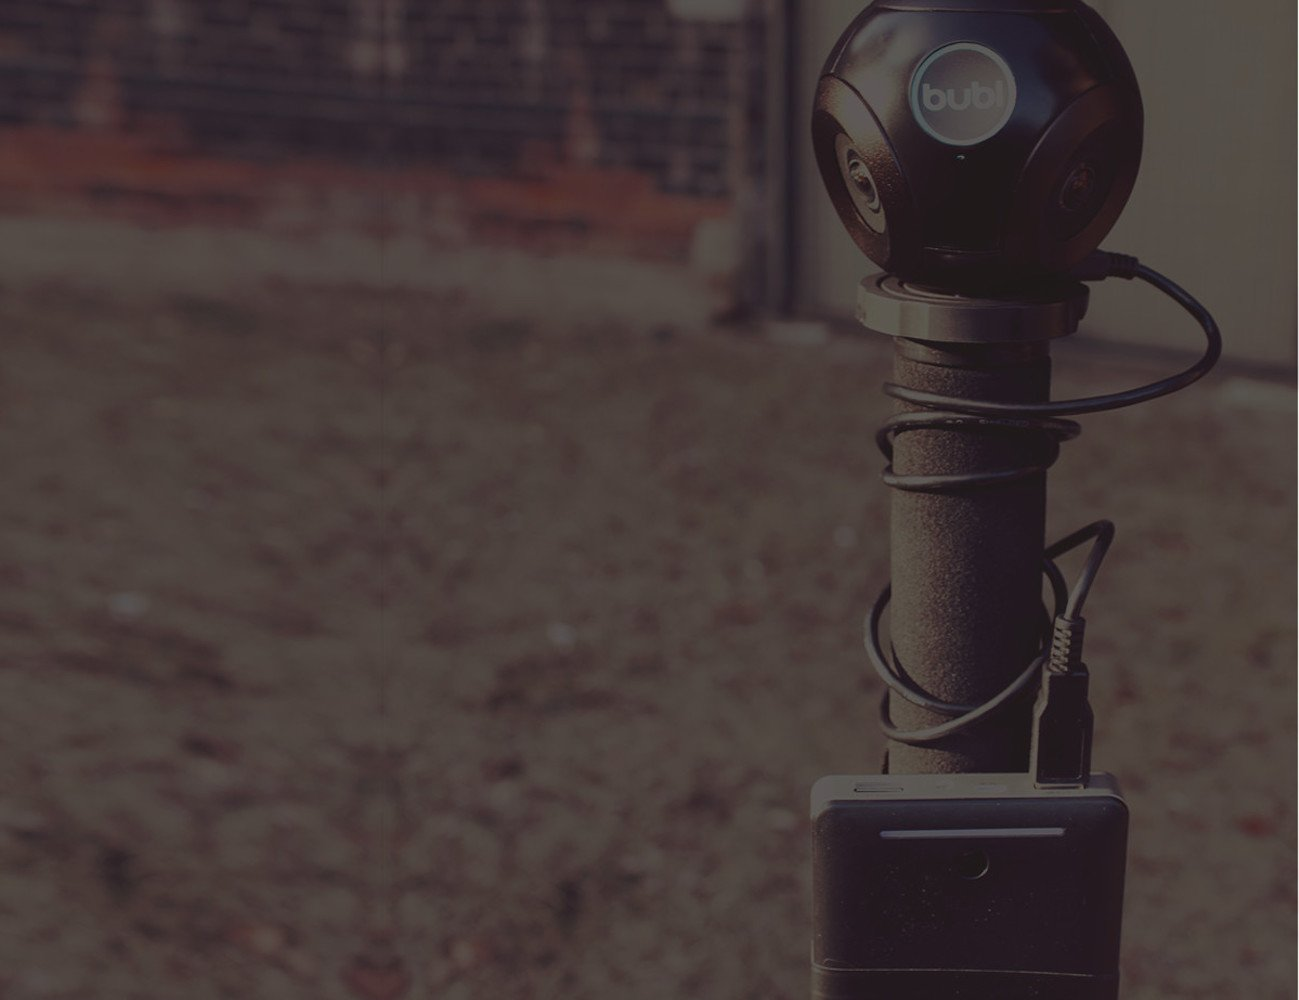 Bublcam Fully Spherical Camera